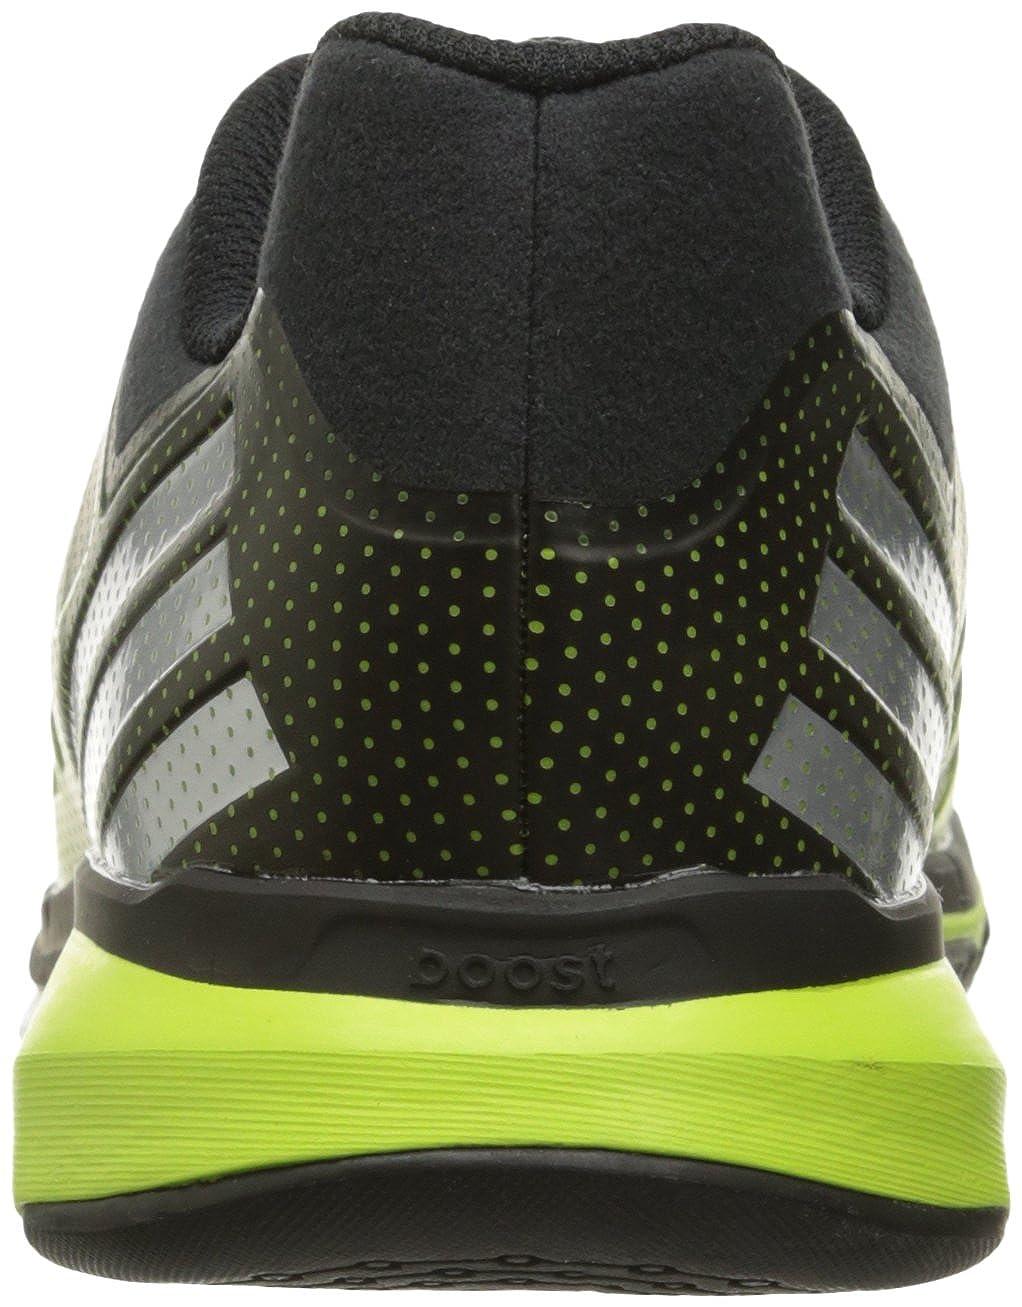 Amazon.com: adidas Performance Volley Response 2 Boost W ...